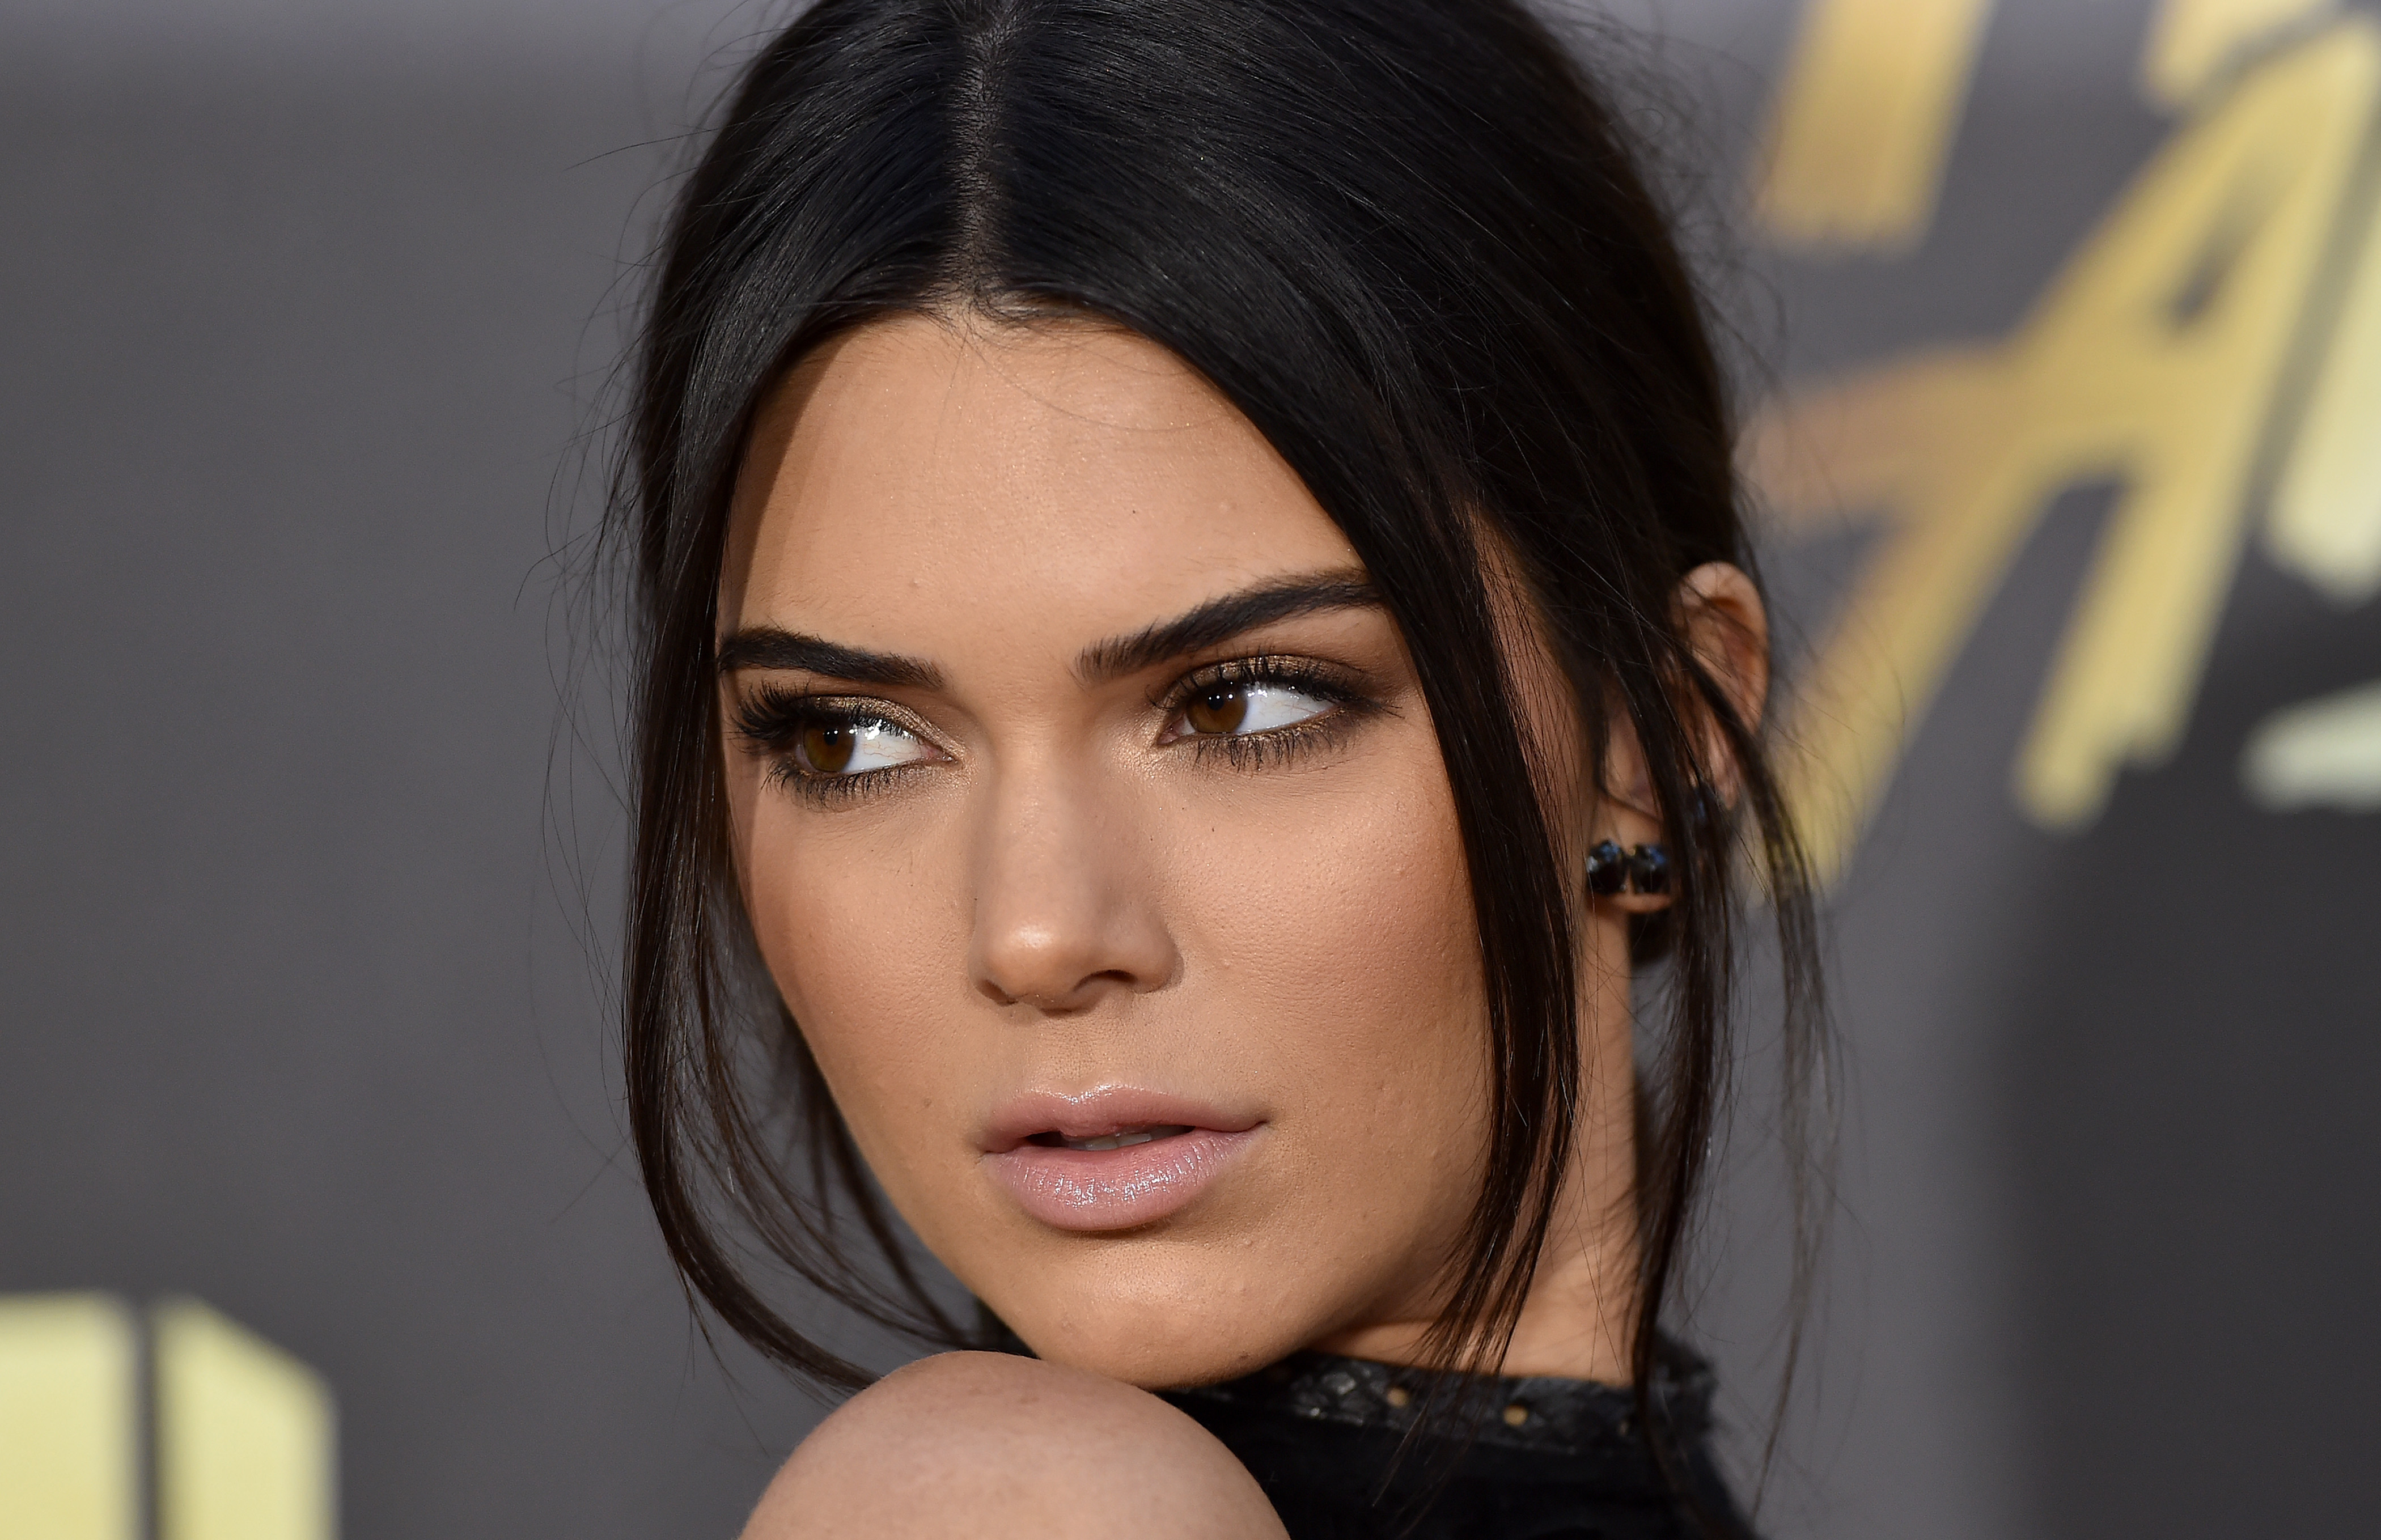 Model Kendall Jenner arrives at the 2016 MTV Movie Awards at Warner Bros. Studios on April 9, 2016 in Burbank, California.